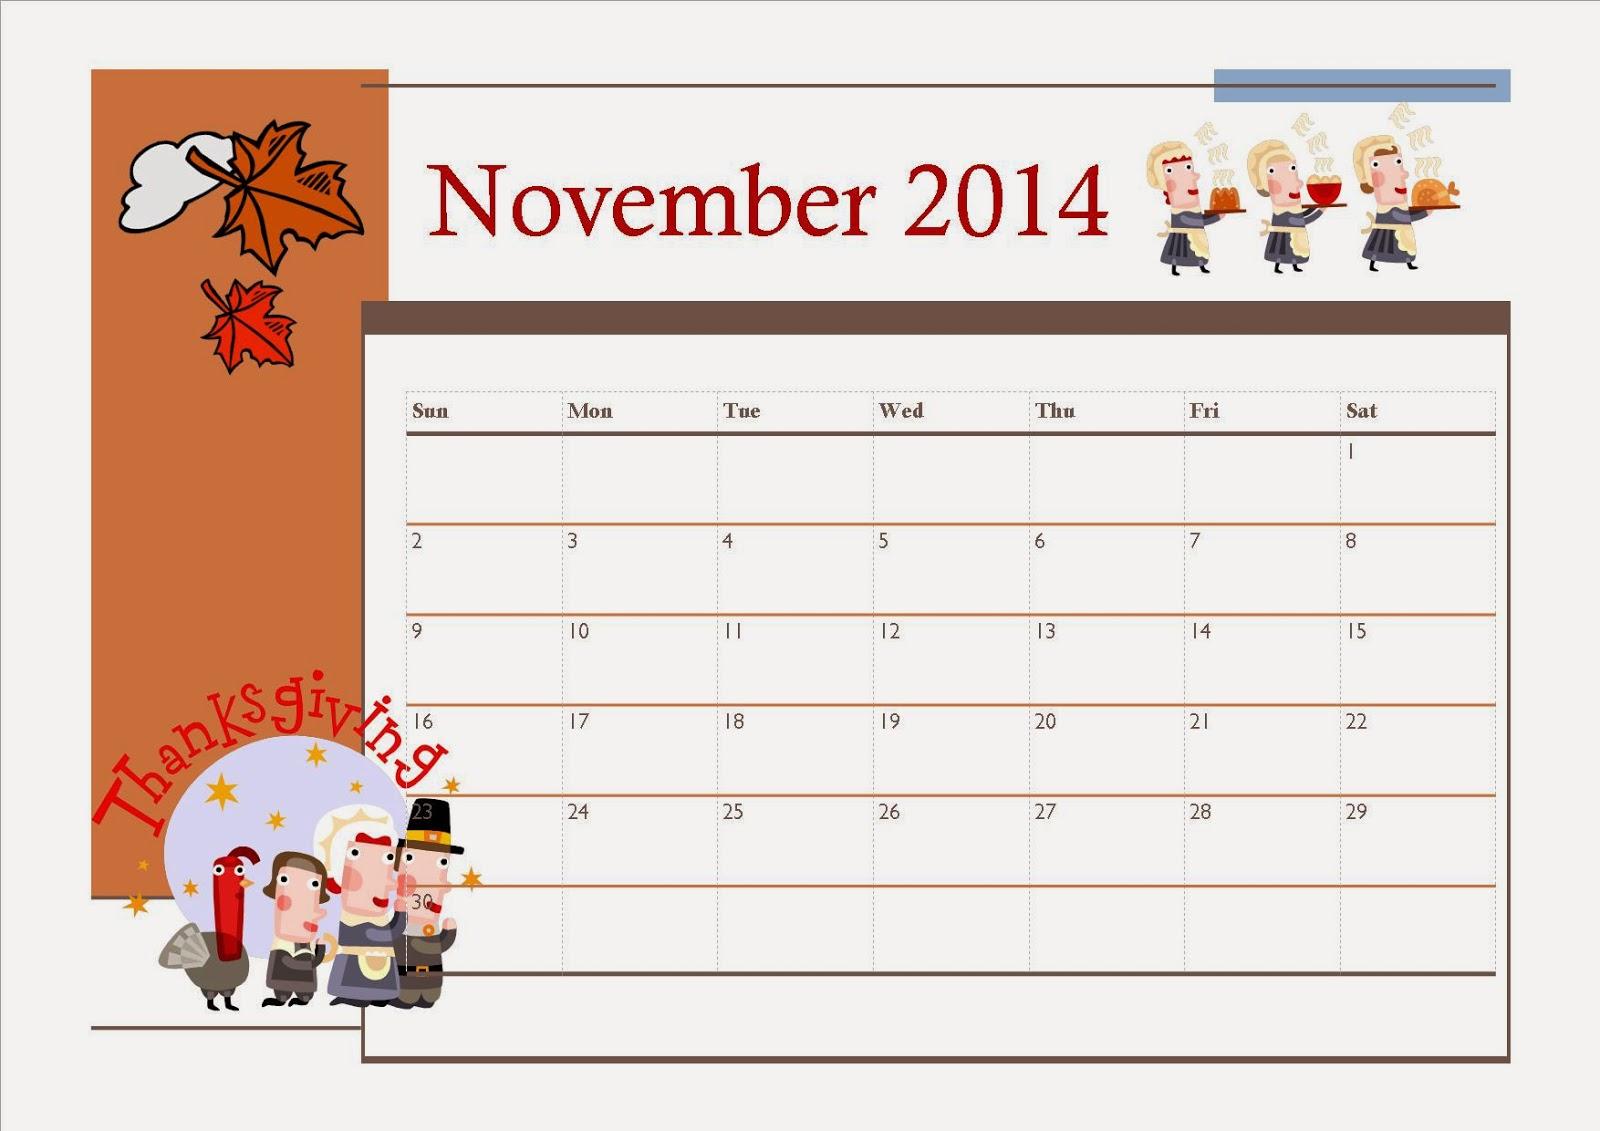 6 Images of Thanksgiving Free Printable Calendar Nov 2014